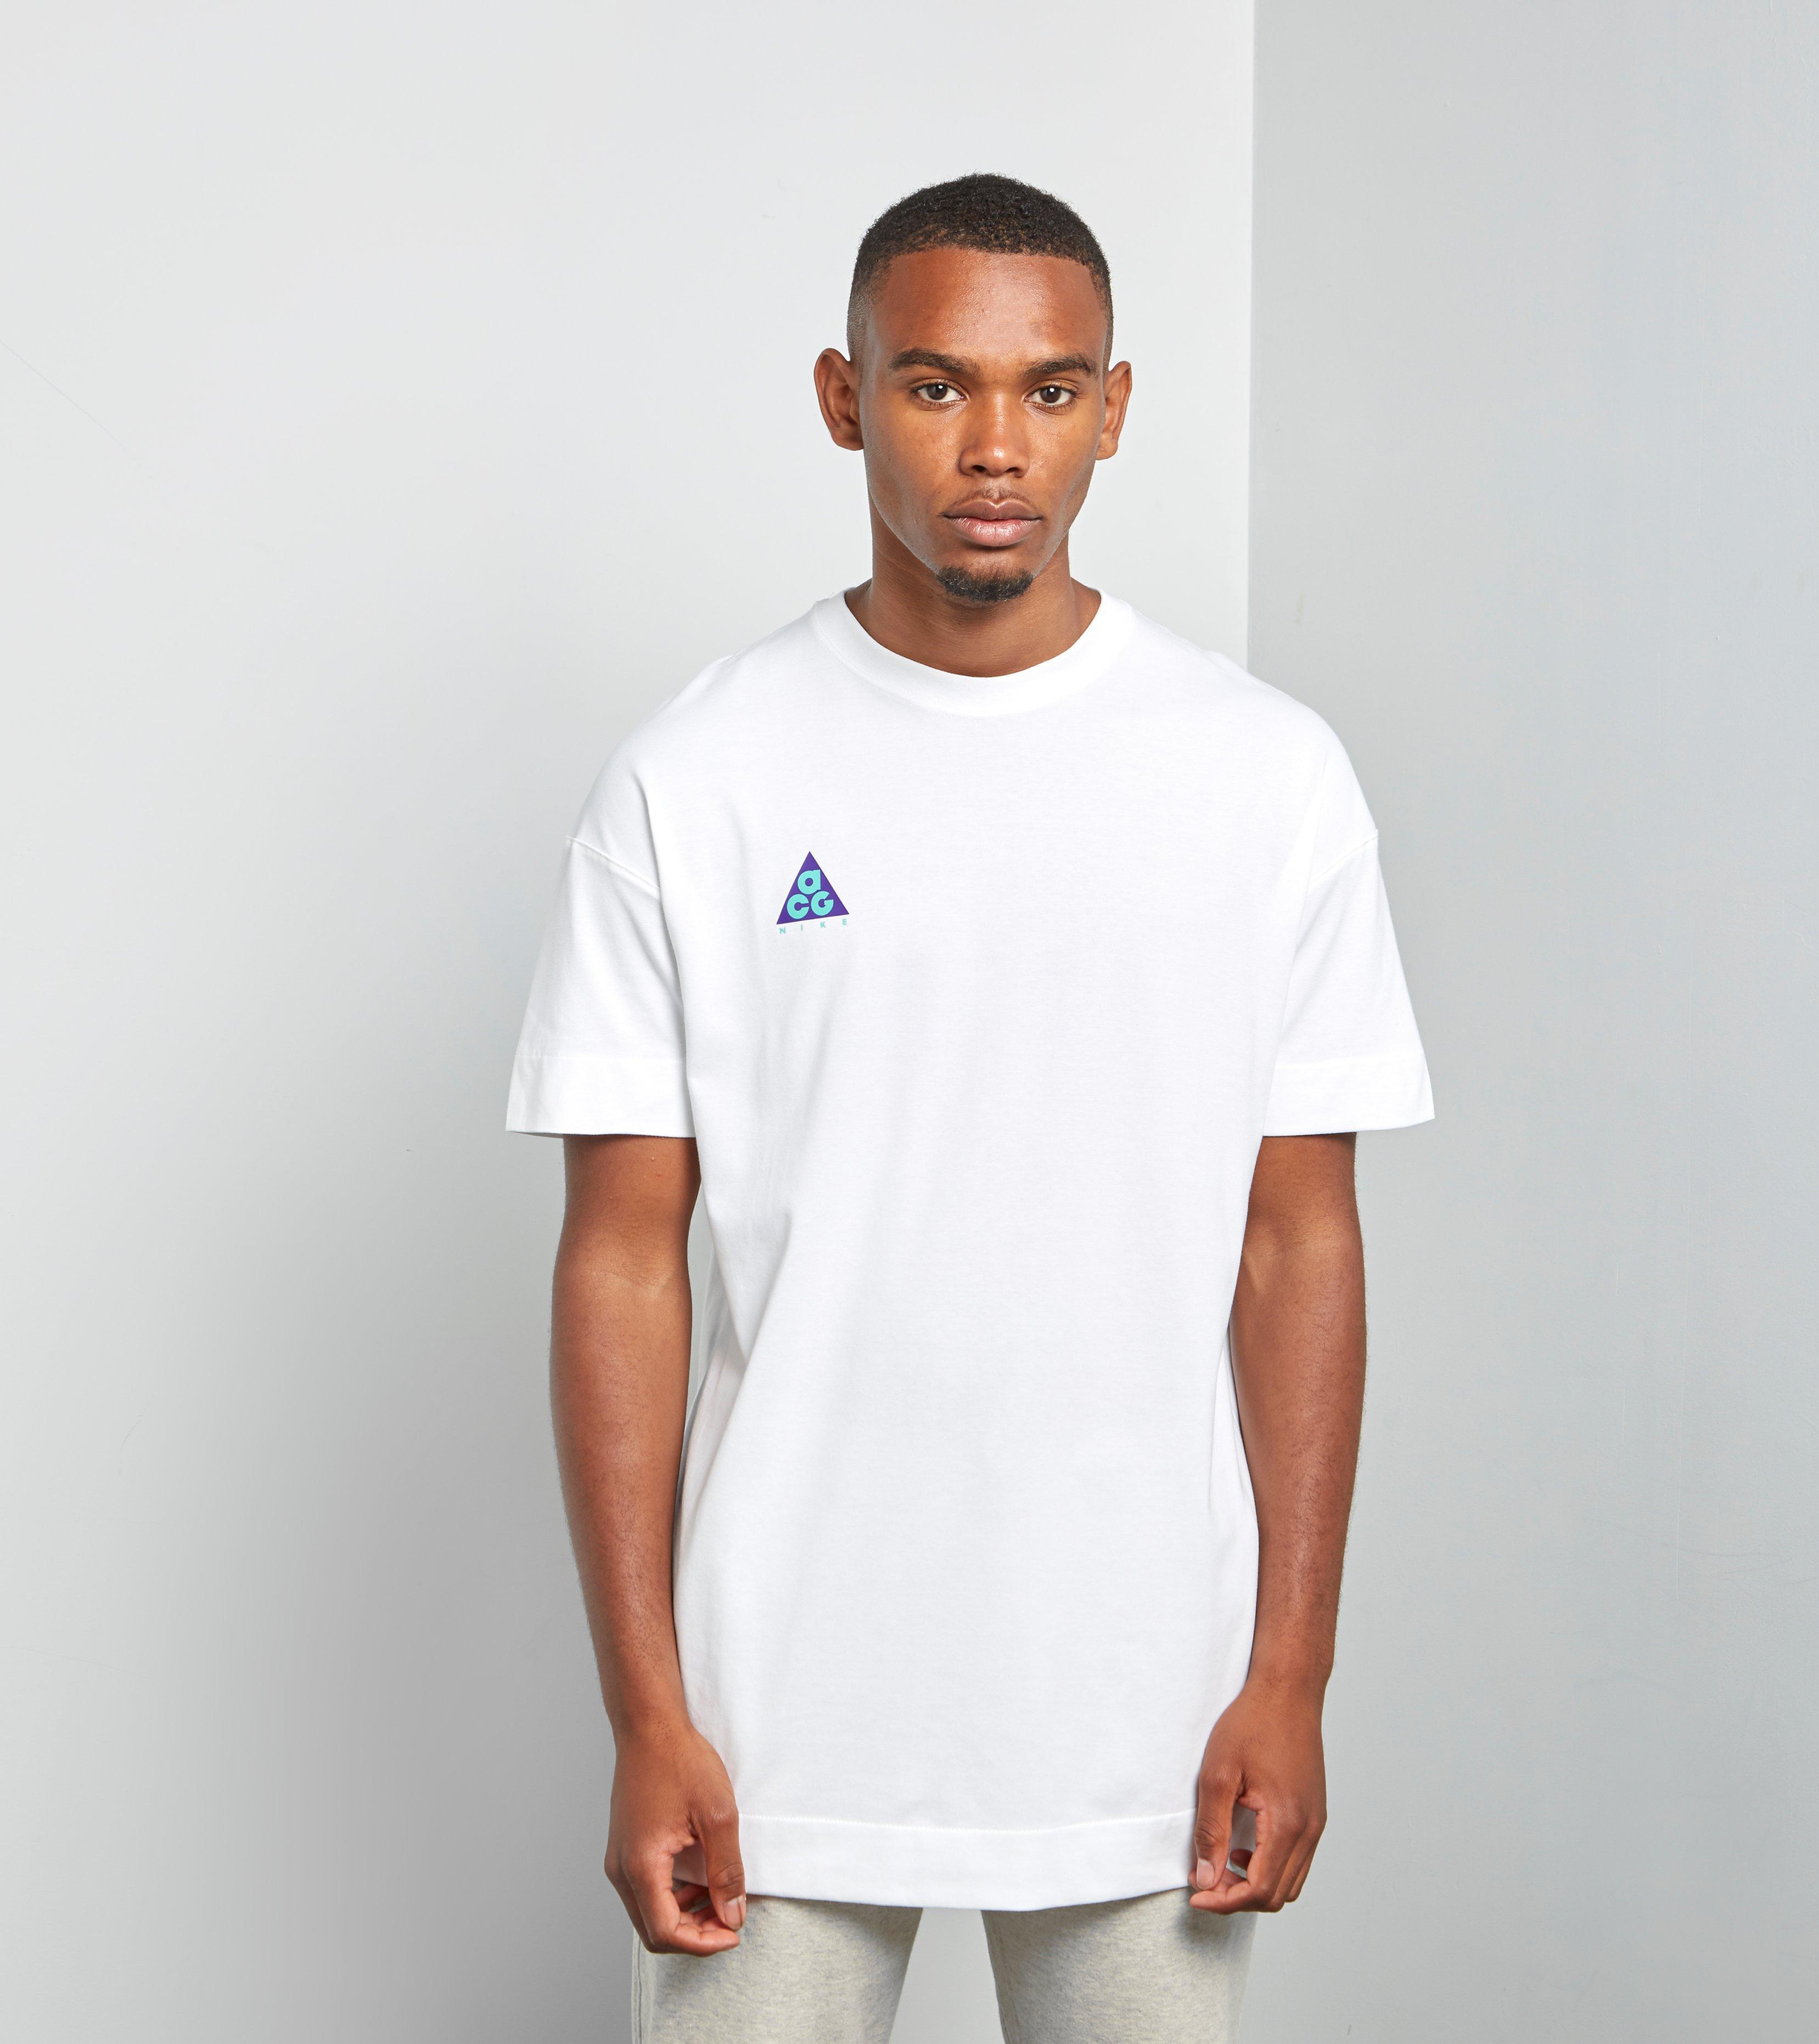 39e52694b1cce8 Lyst - Nike Acg T-shirt Qs in White for Men